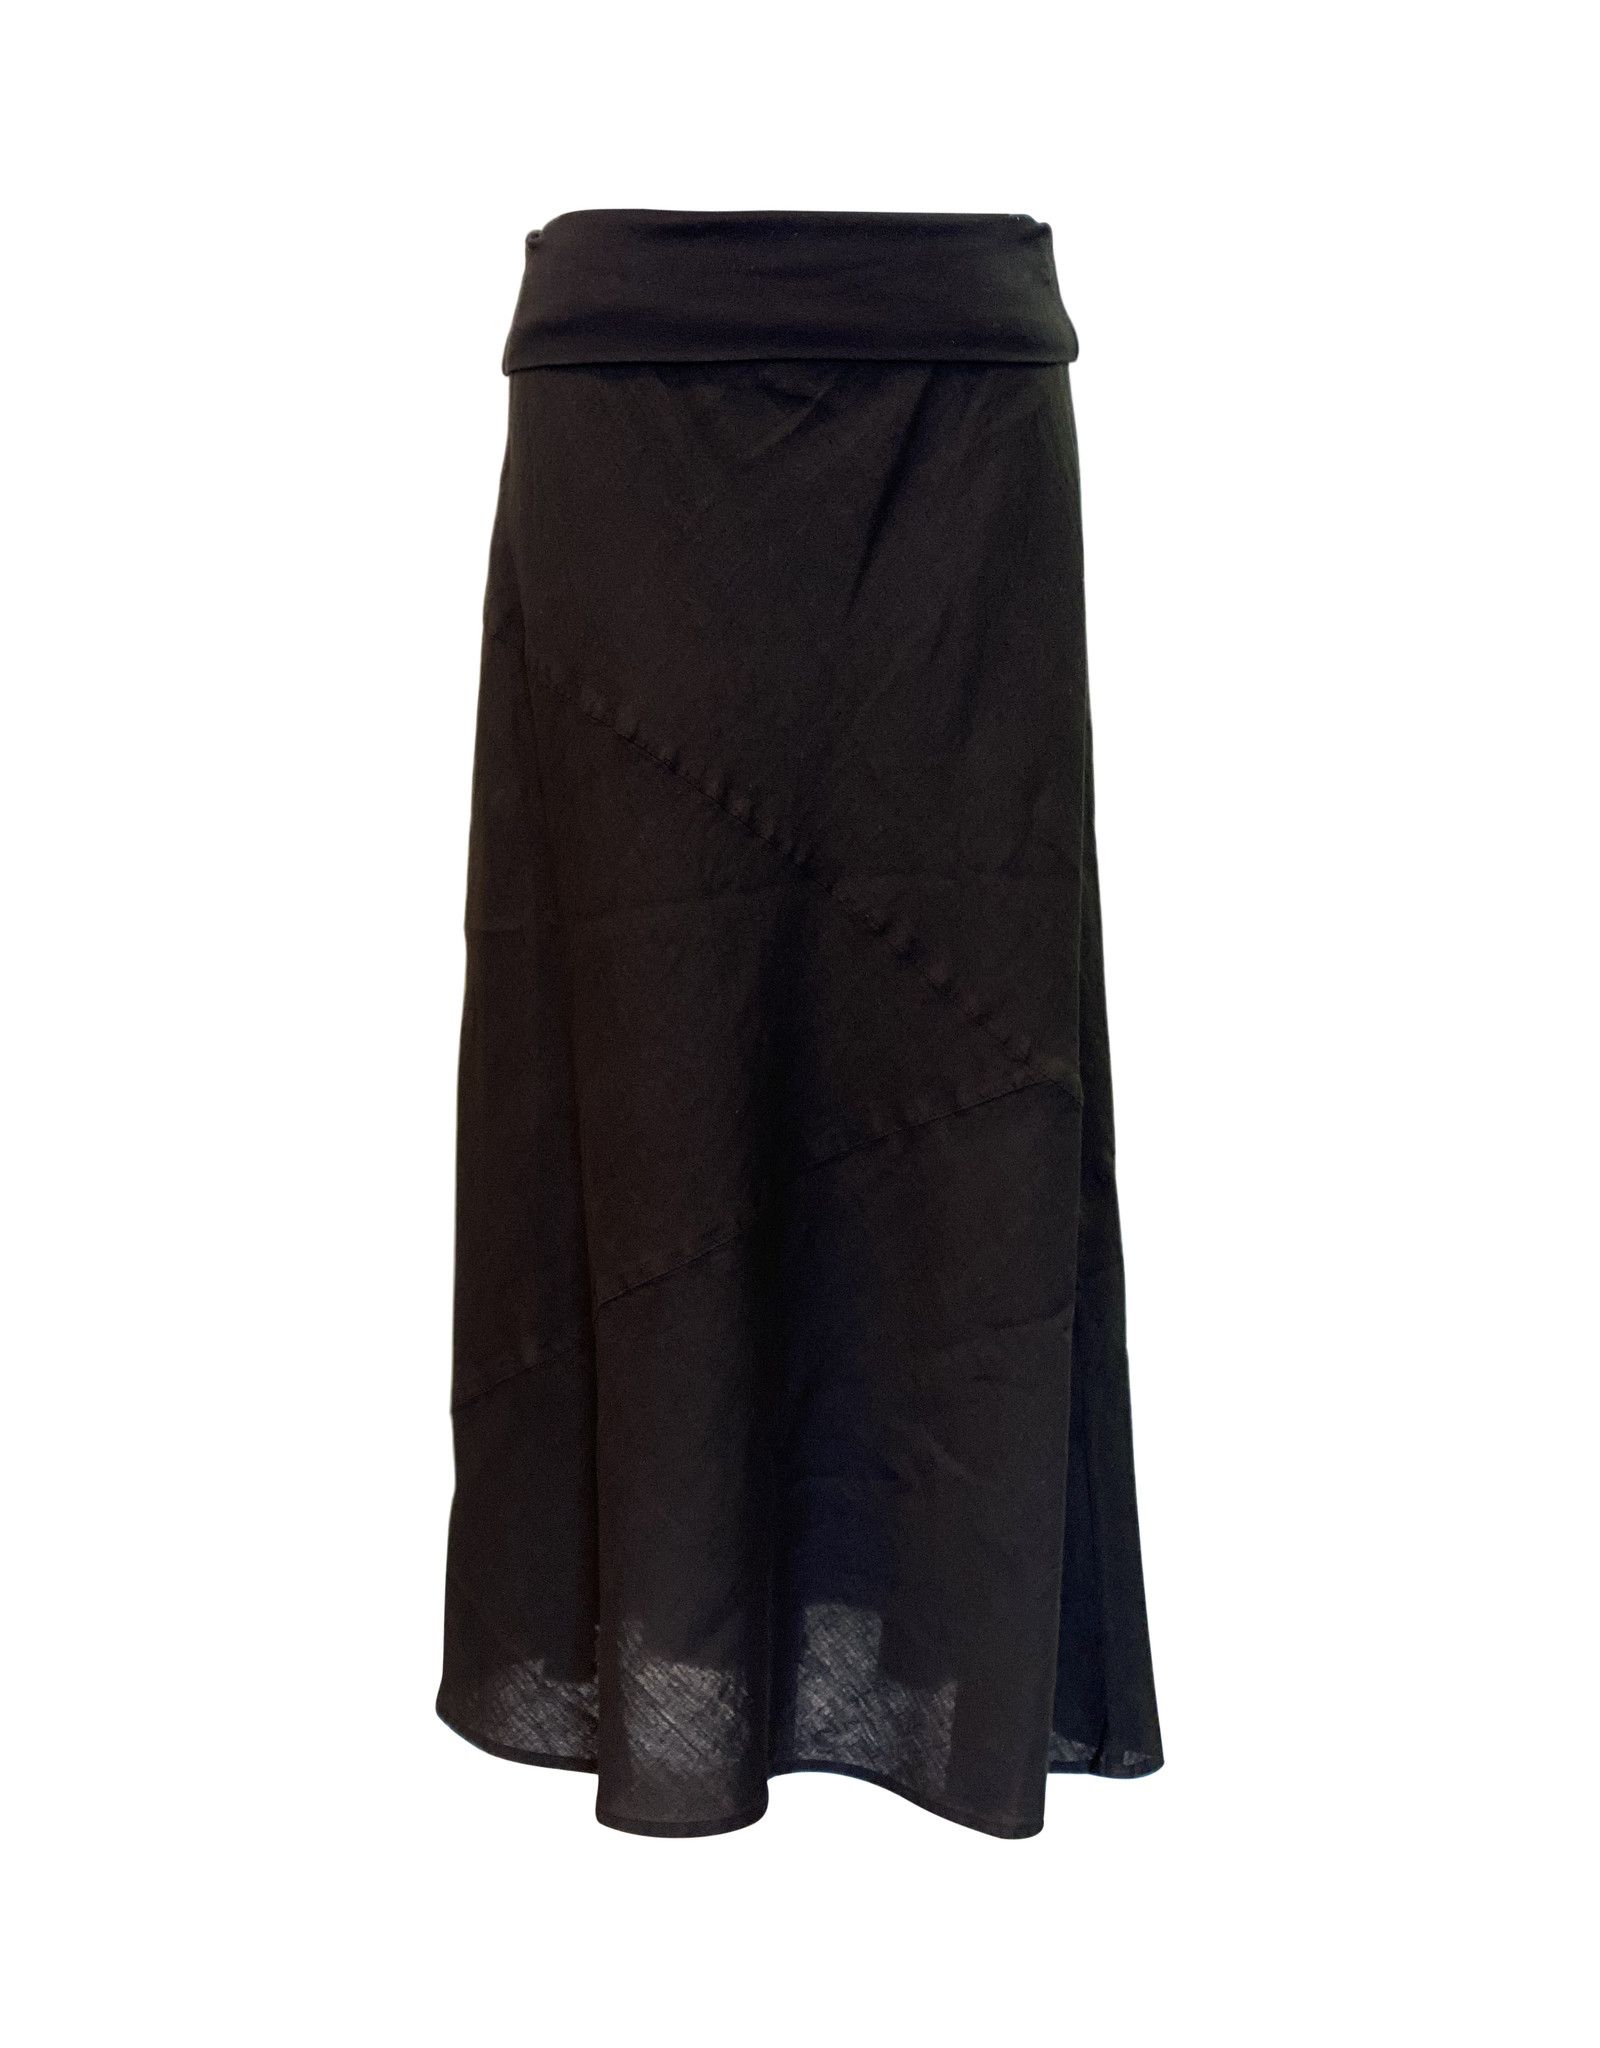 Click Click-Linen Seamed Skirt